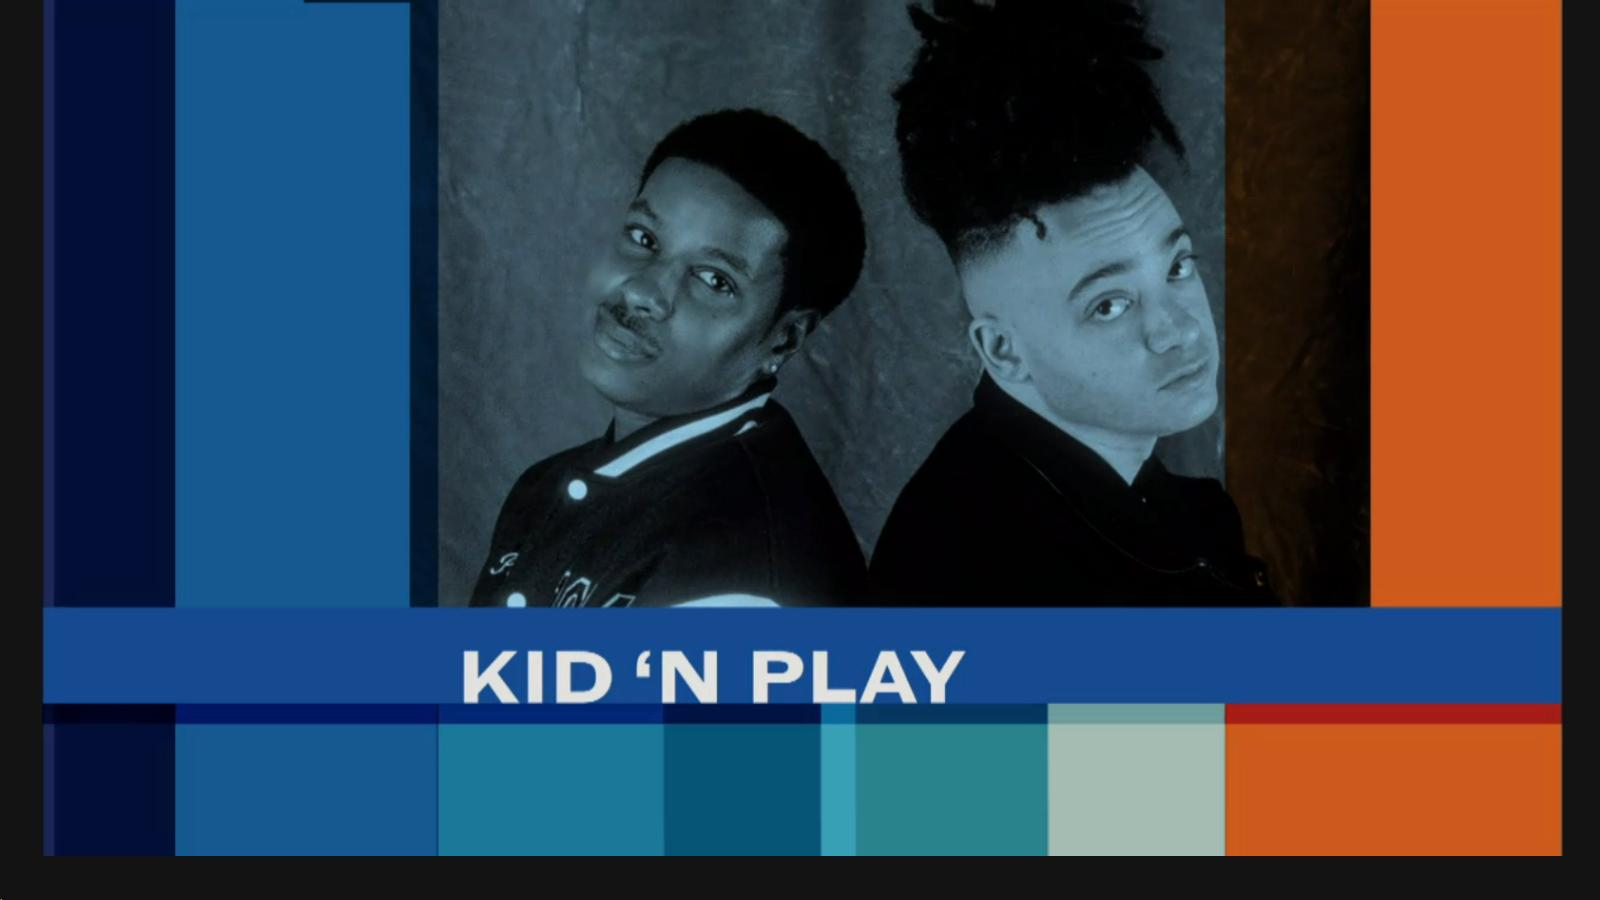 Unsung Kid N Play